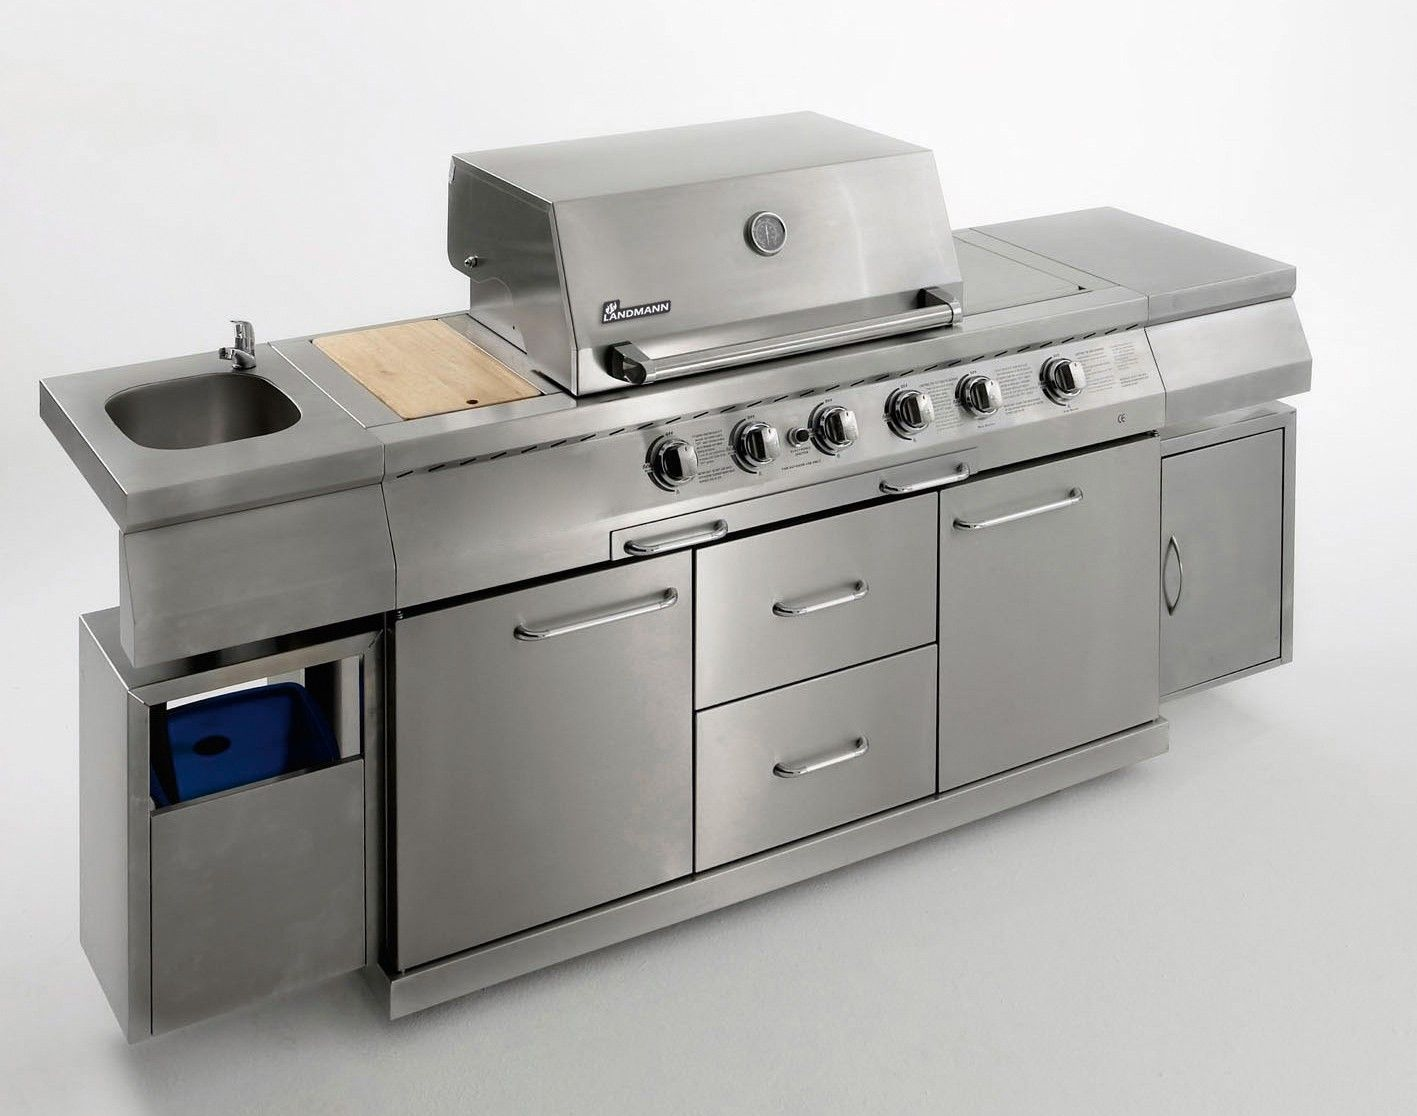 Outdoor Küche Edelstahl Preis : Landmann aussenküche edelstahl stainless steel